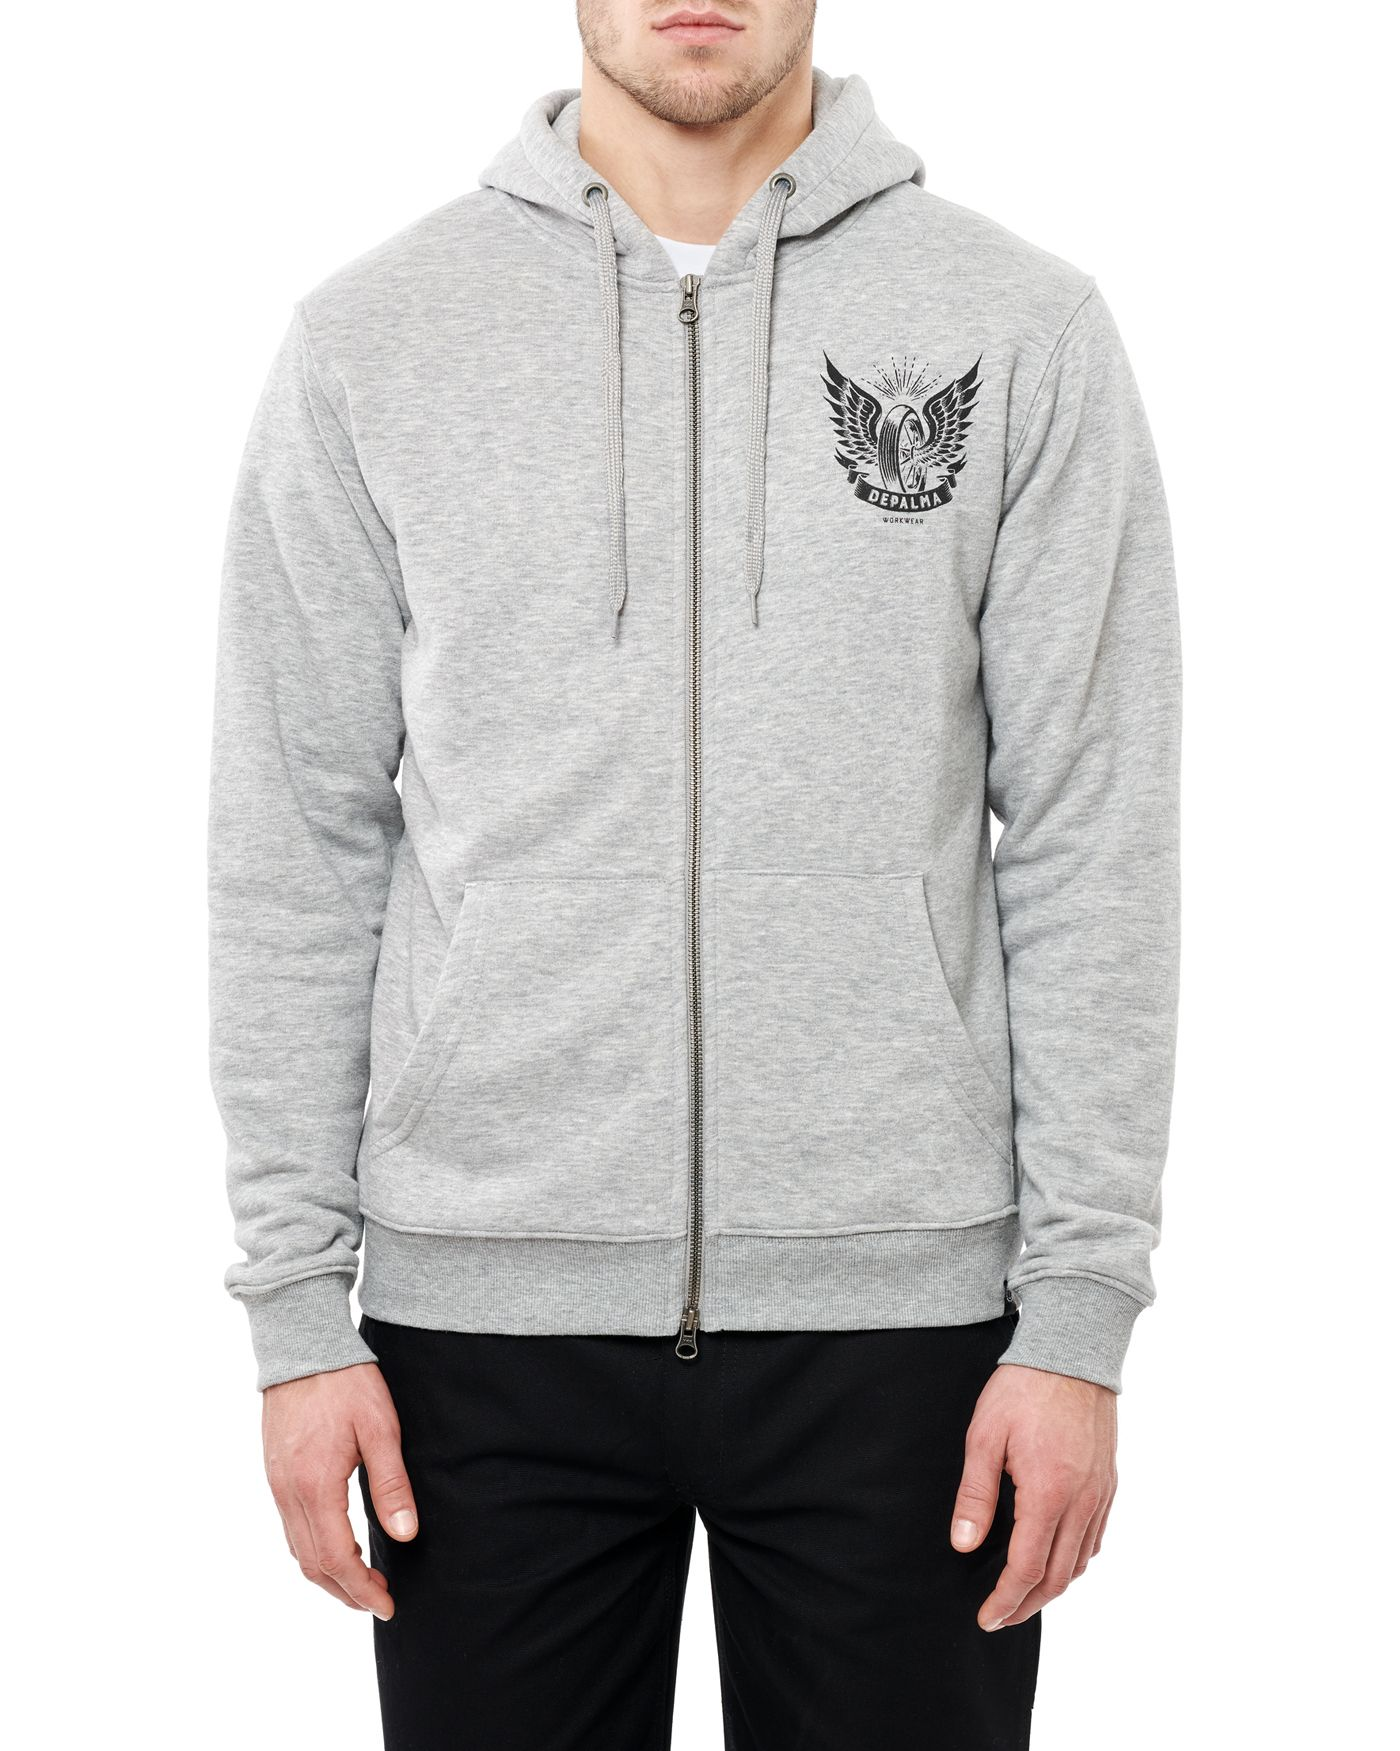 Photo of Night Zip Hooded Sweatshirt, Grey Melange